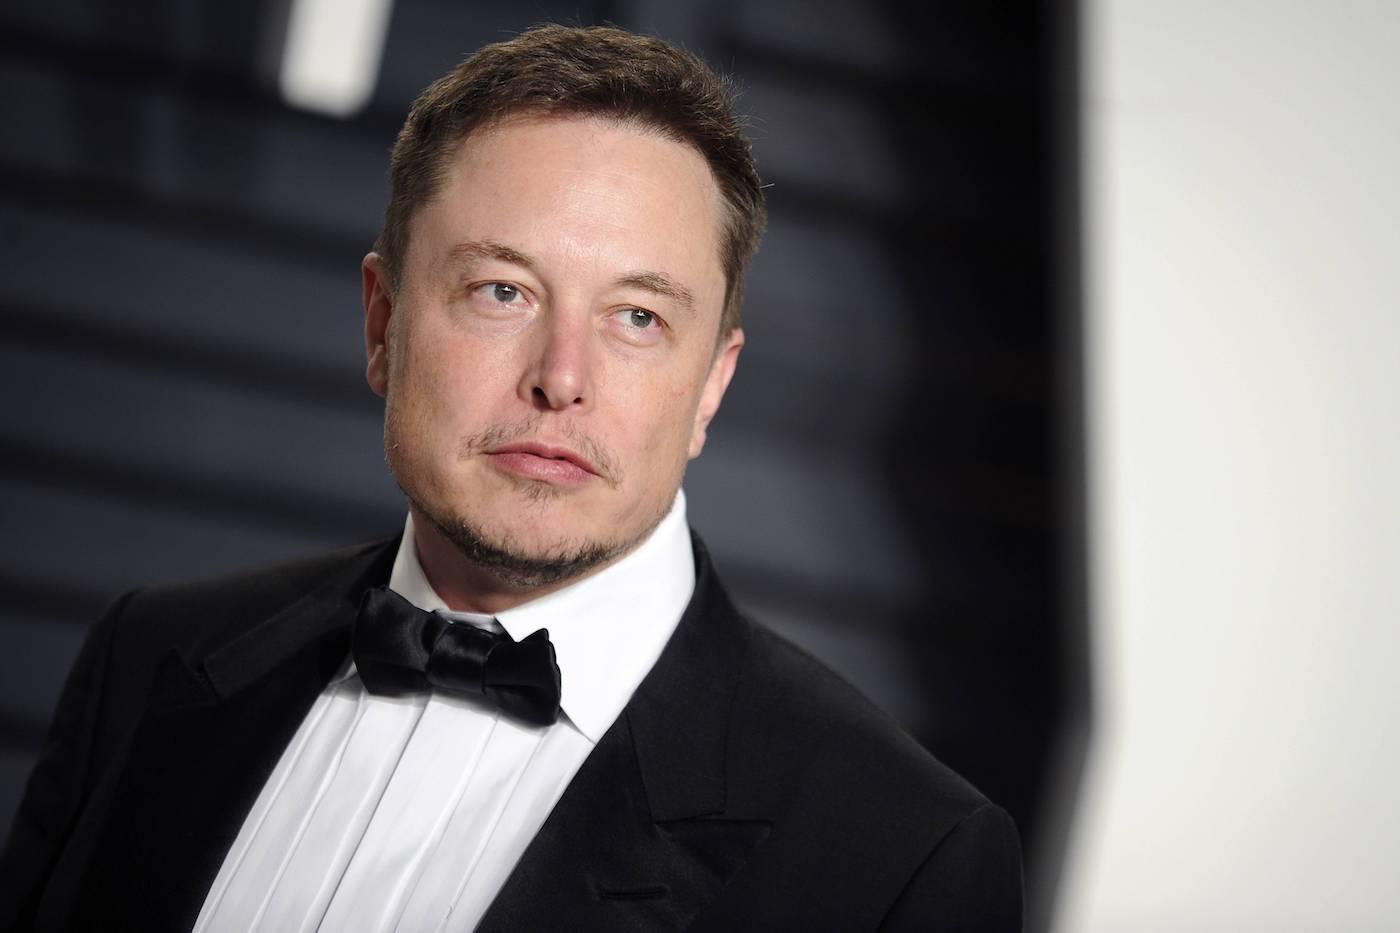 Elon Musk Vermögen